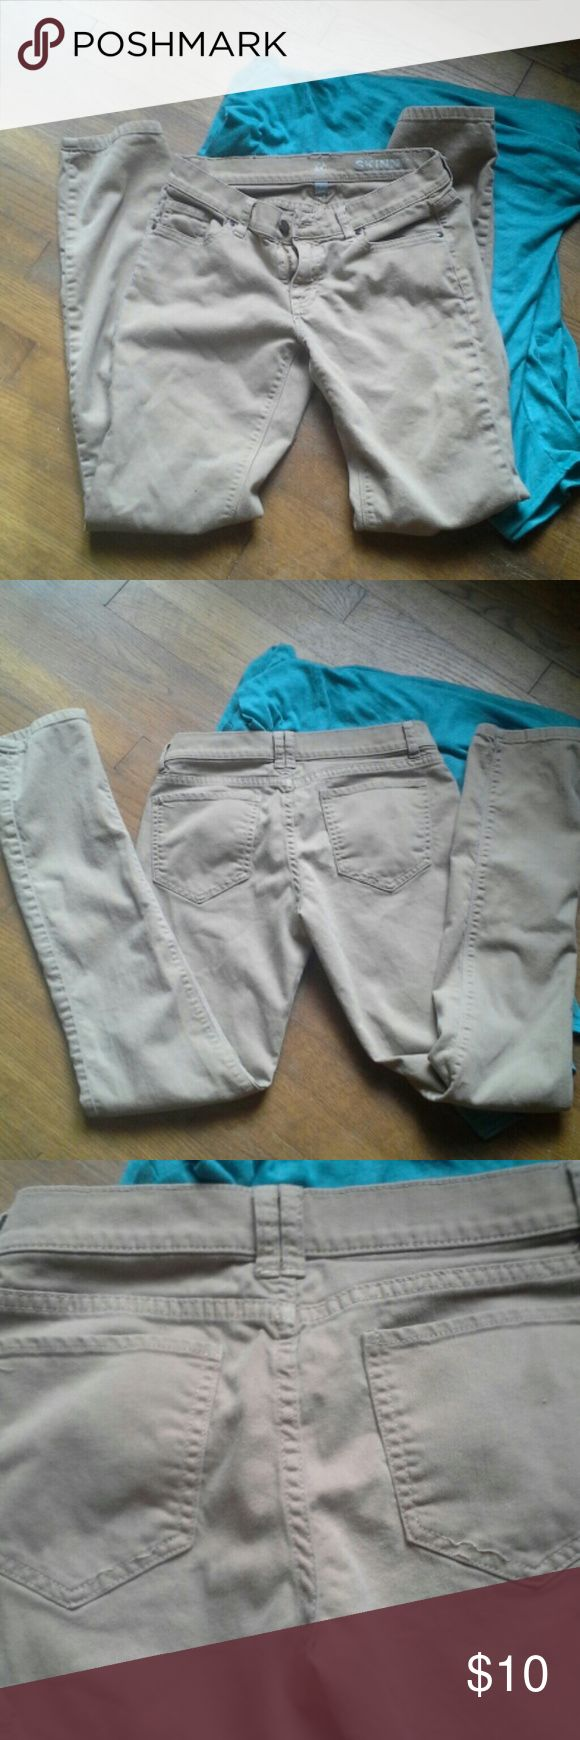 Tan skinny jeans Tan skinny jeans. Loose stitching on back pockets. A couple picks. New York & Company Jeans Skinny